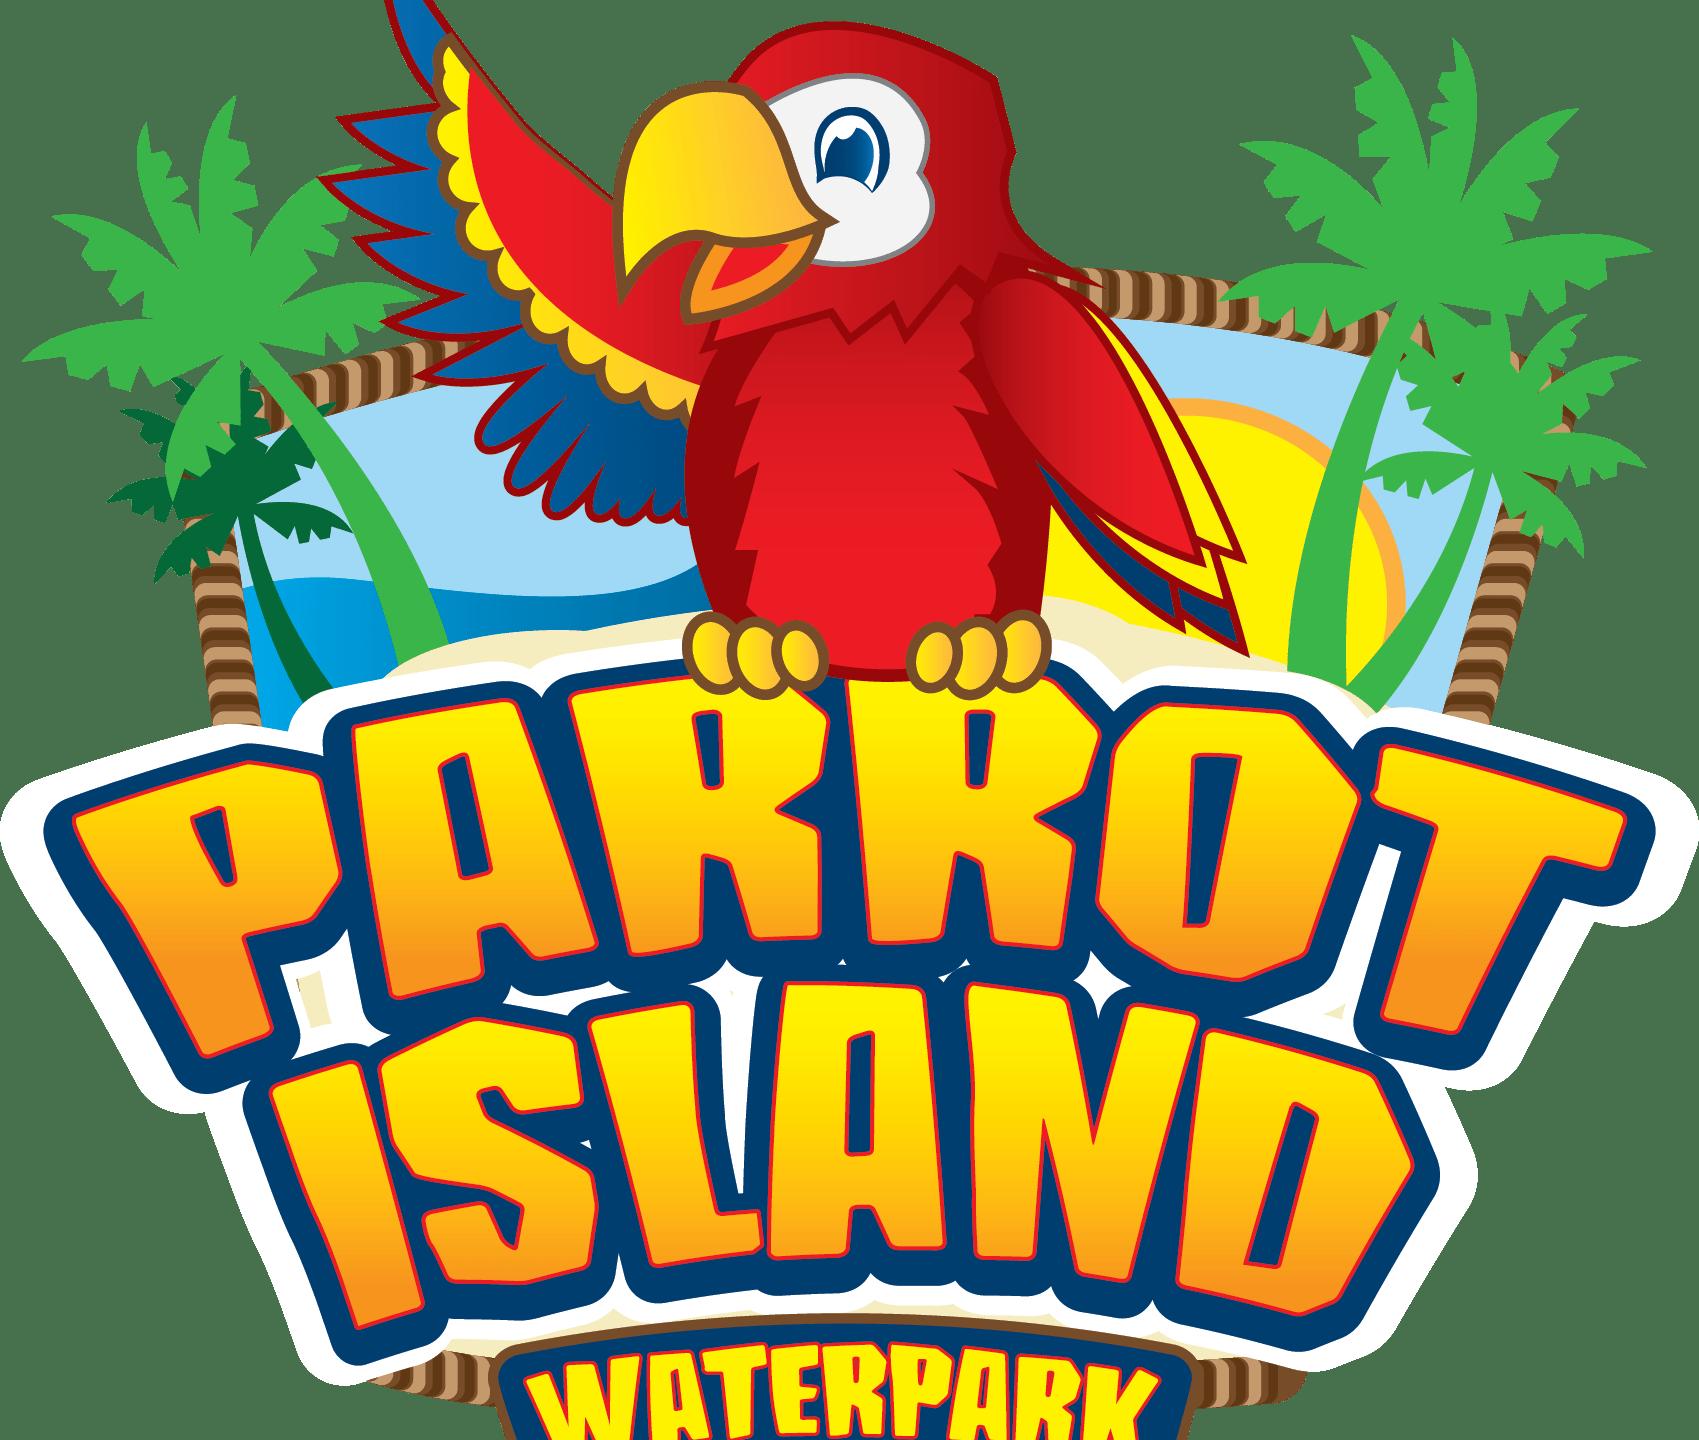 parrotisland-logo_1495057203737.png